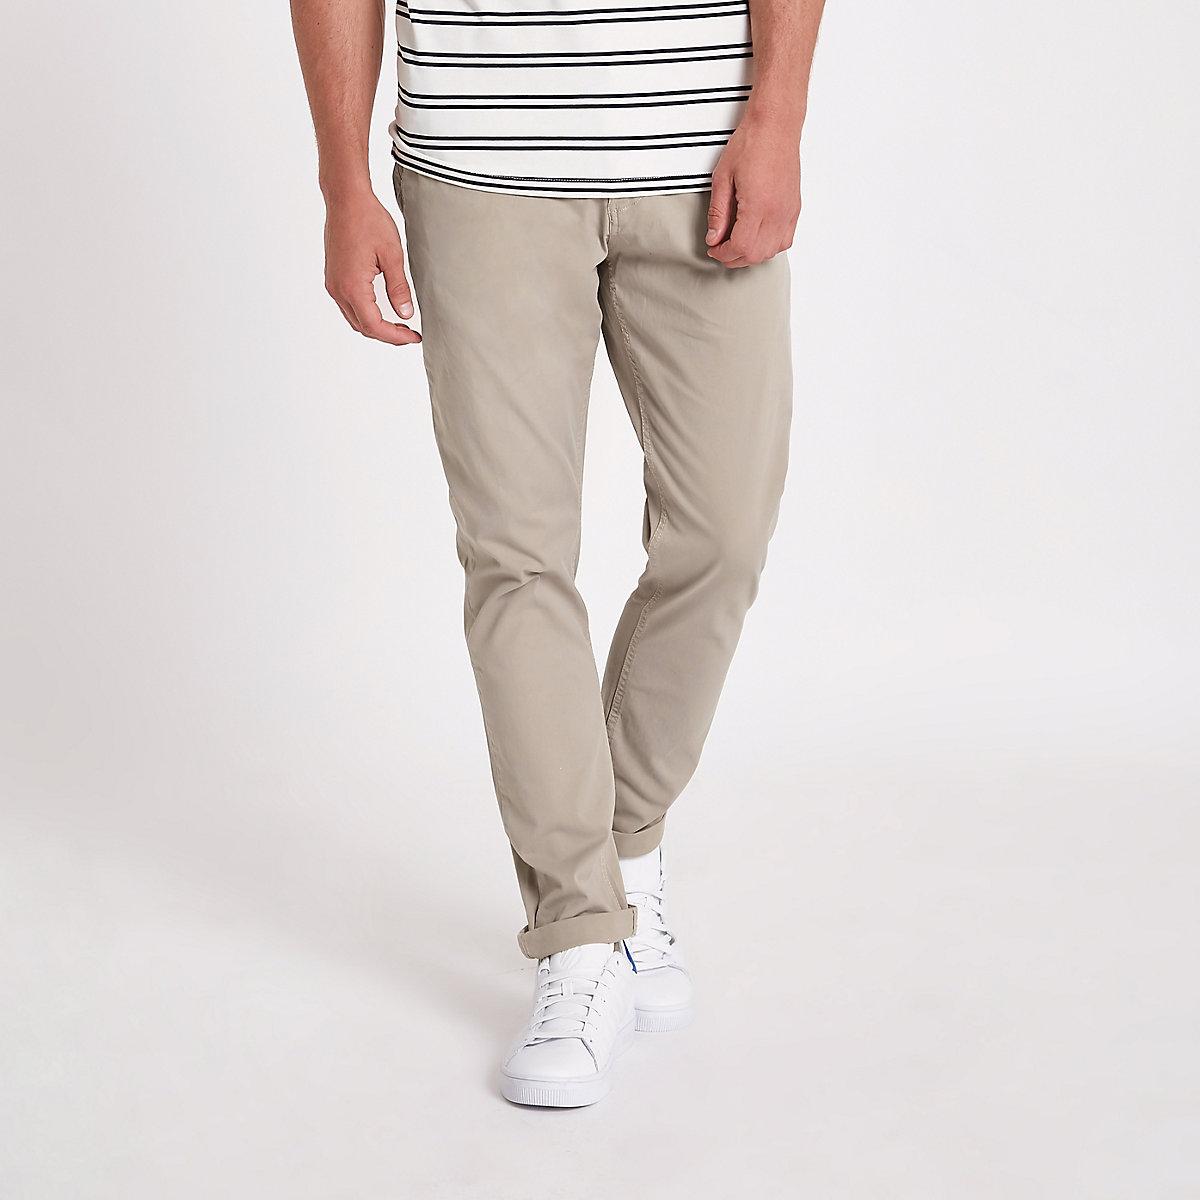 Minimum brown slim fit chino pants